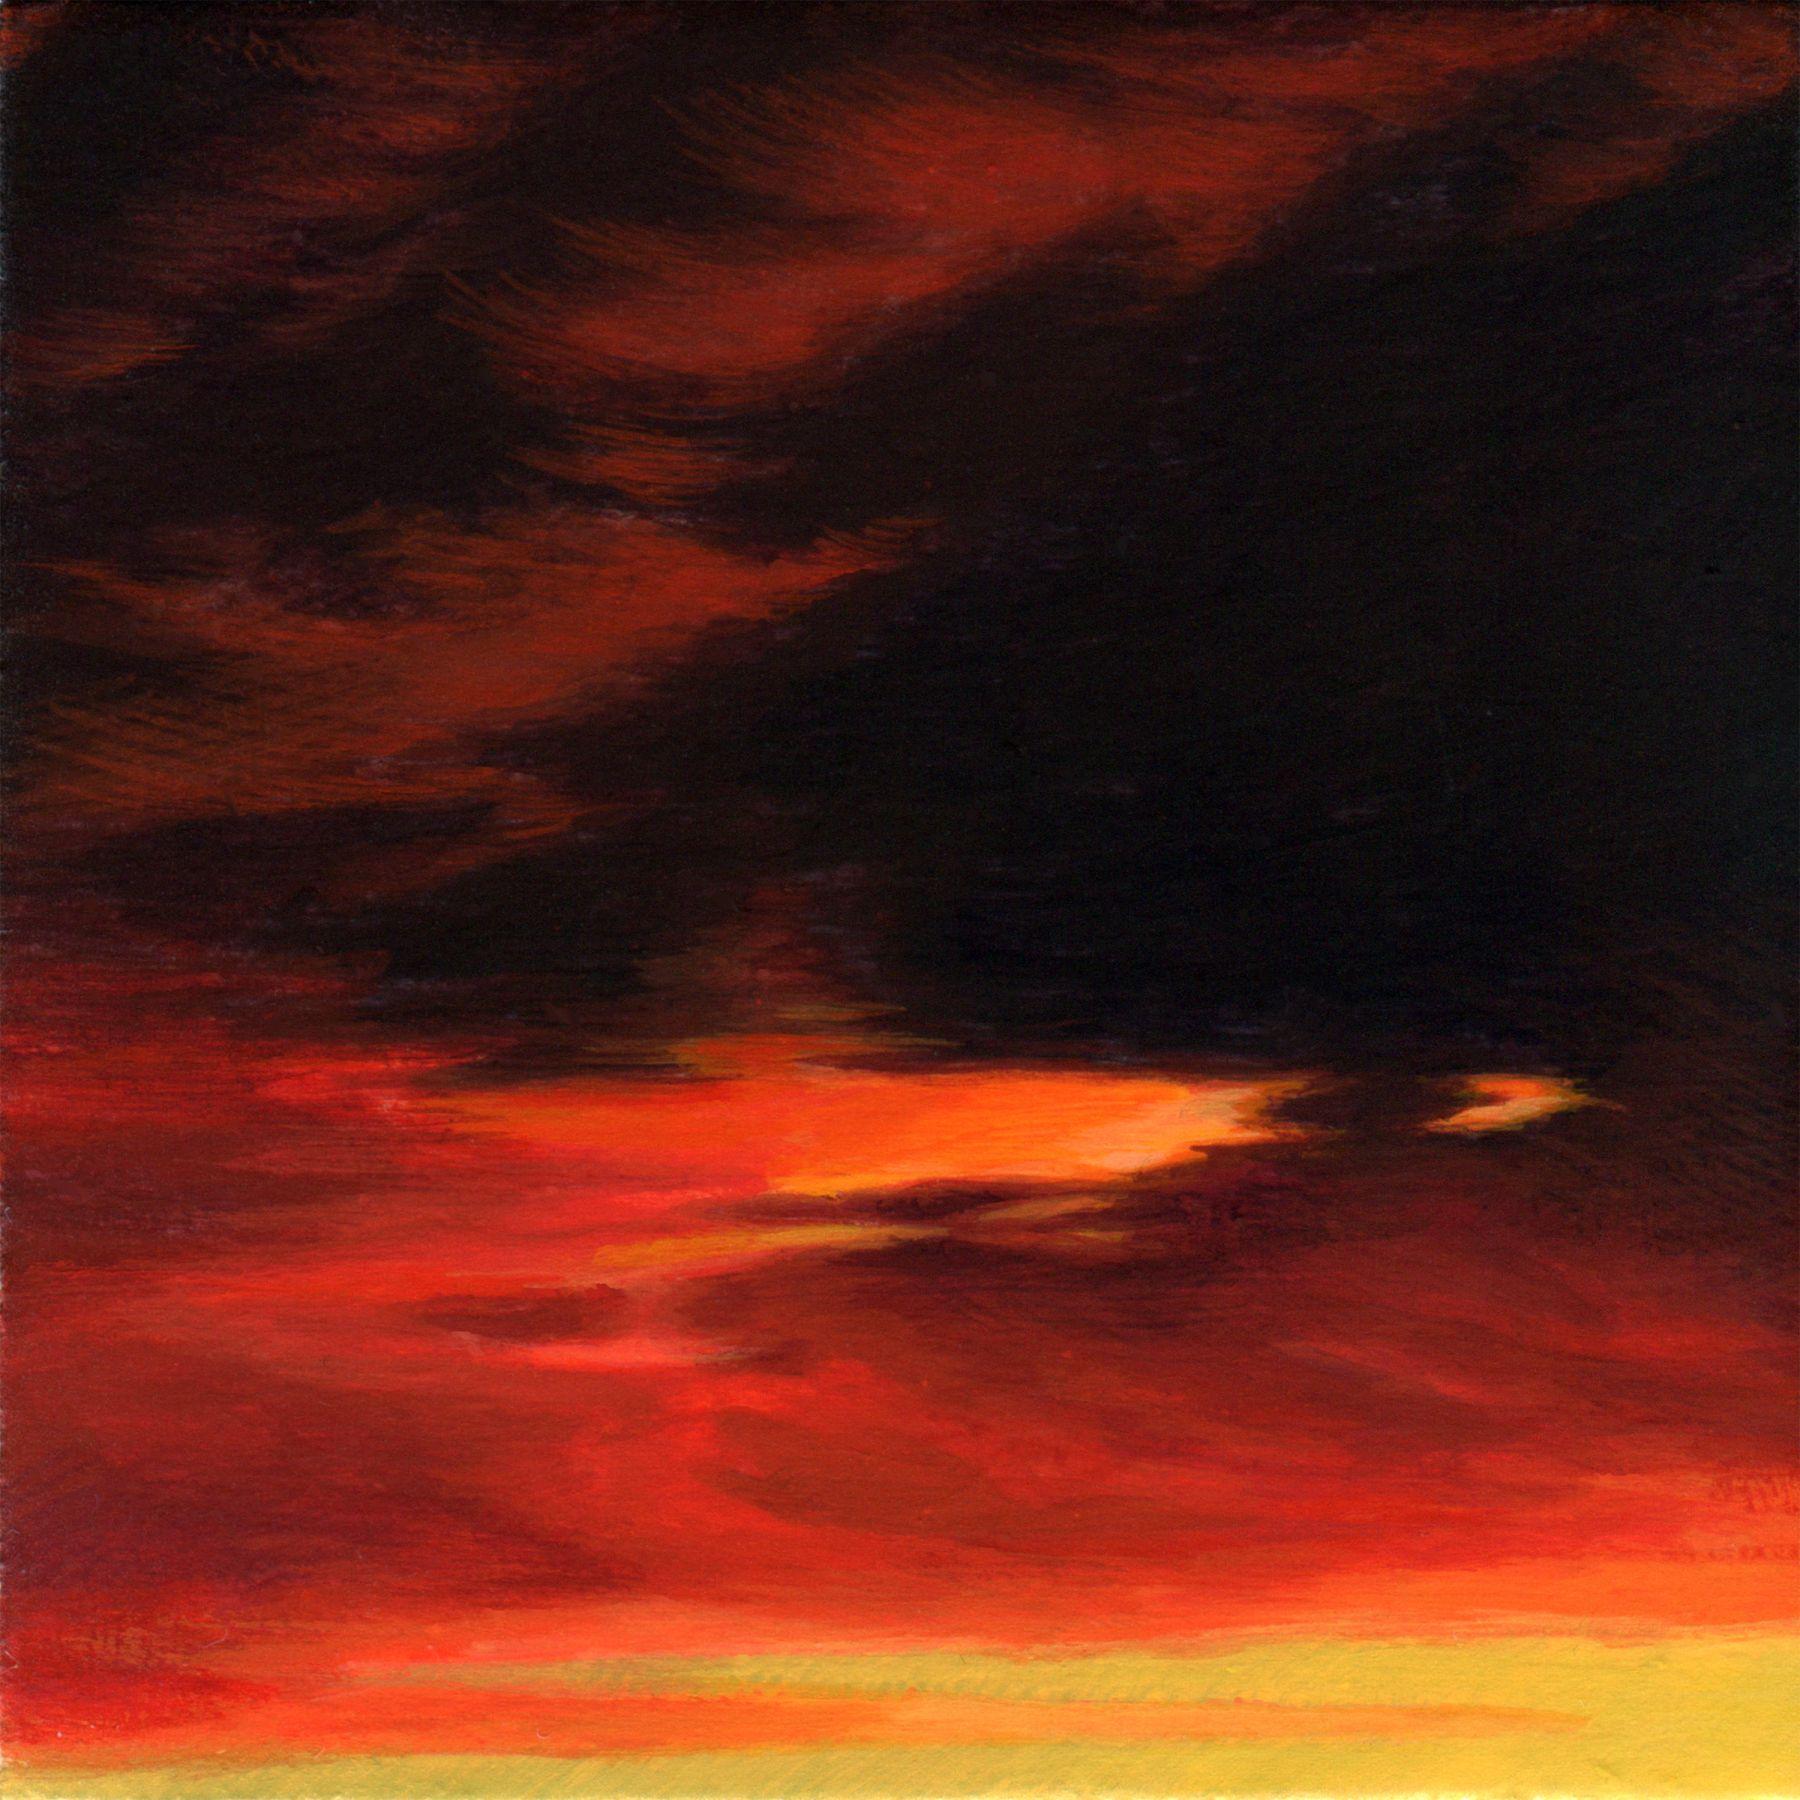 ADAM MYSOCK Red Sky in the Morning[Day Three], 2017